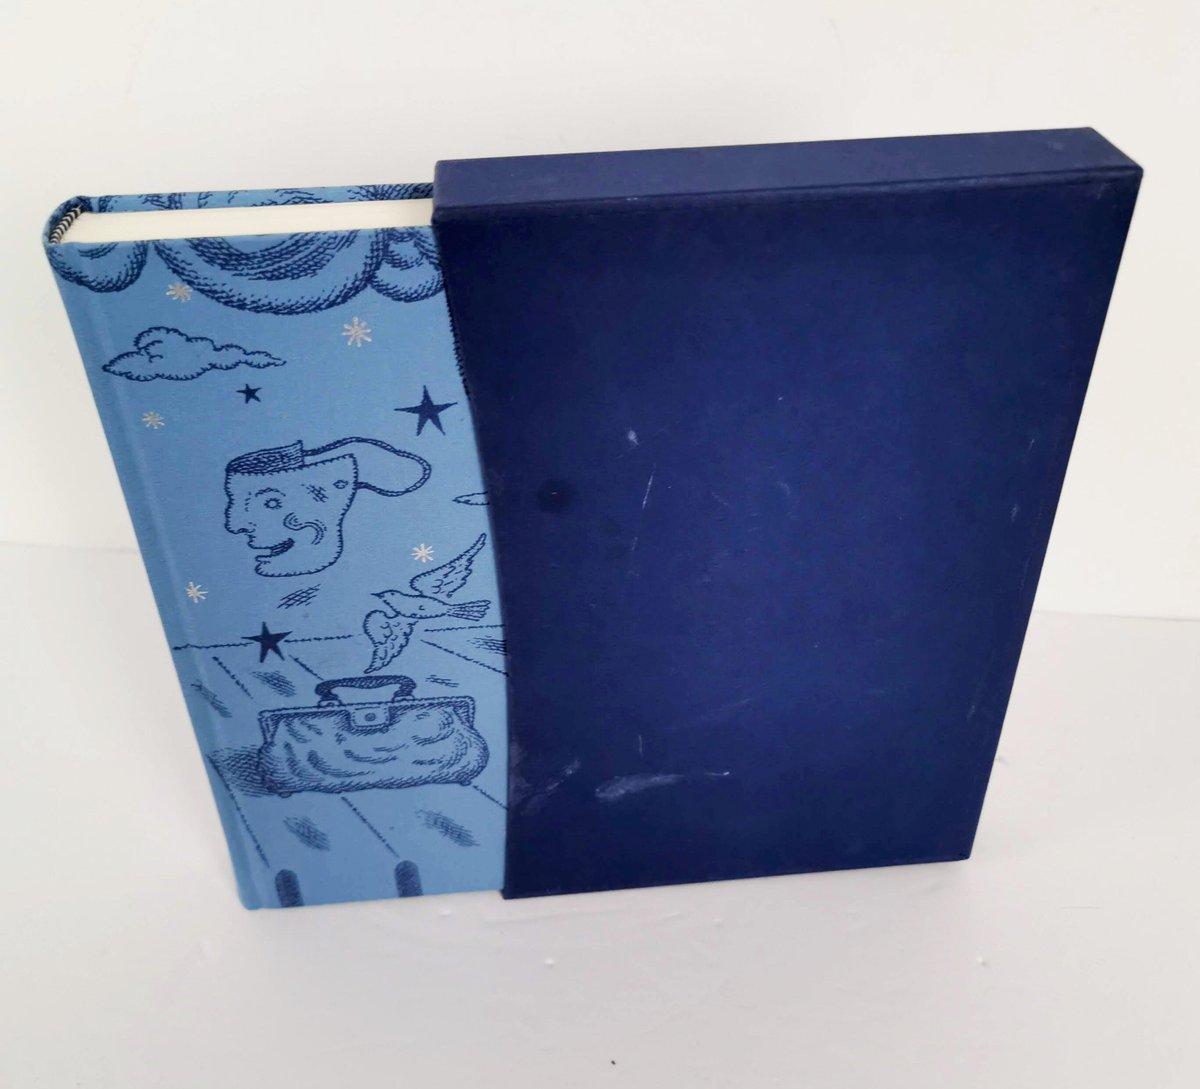 Wit of Oscar Wilde Folio Society 1997 HC Fine Binding with Slip Case Get it Fast! #societywit #wildewit #witsociety